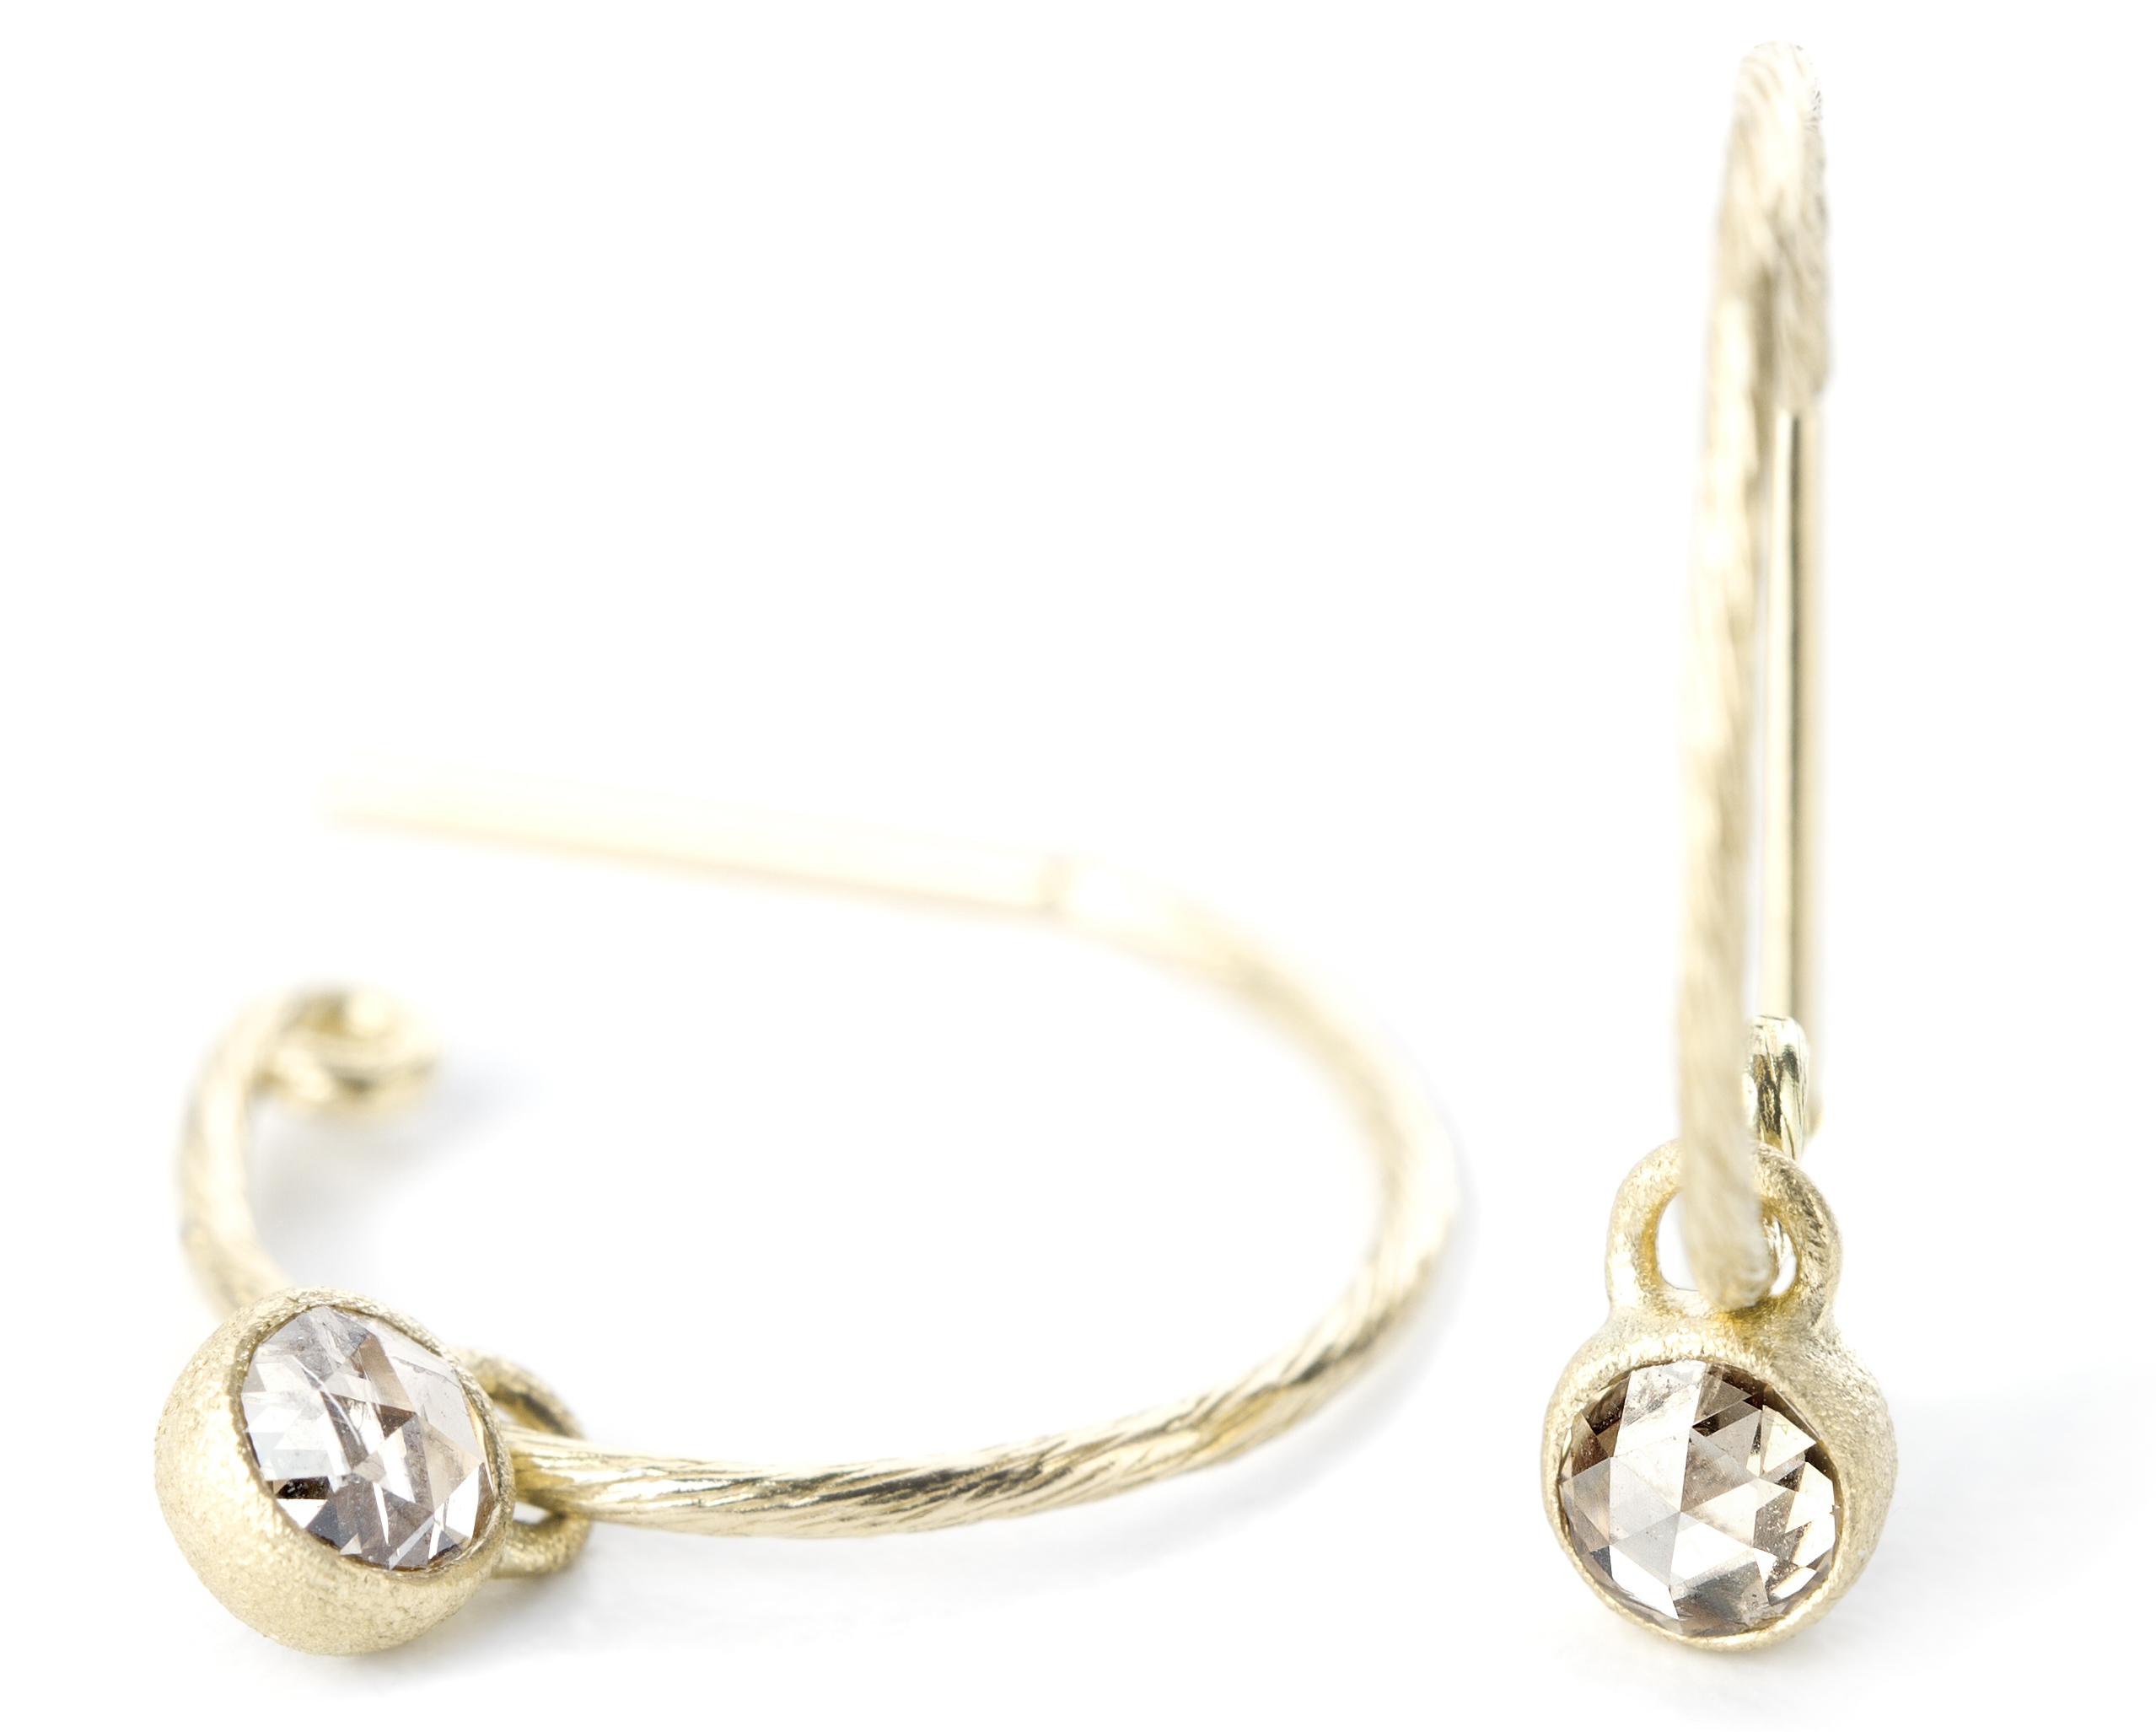 Nina Nguyen Adorn earring charms   JCK On Your Market